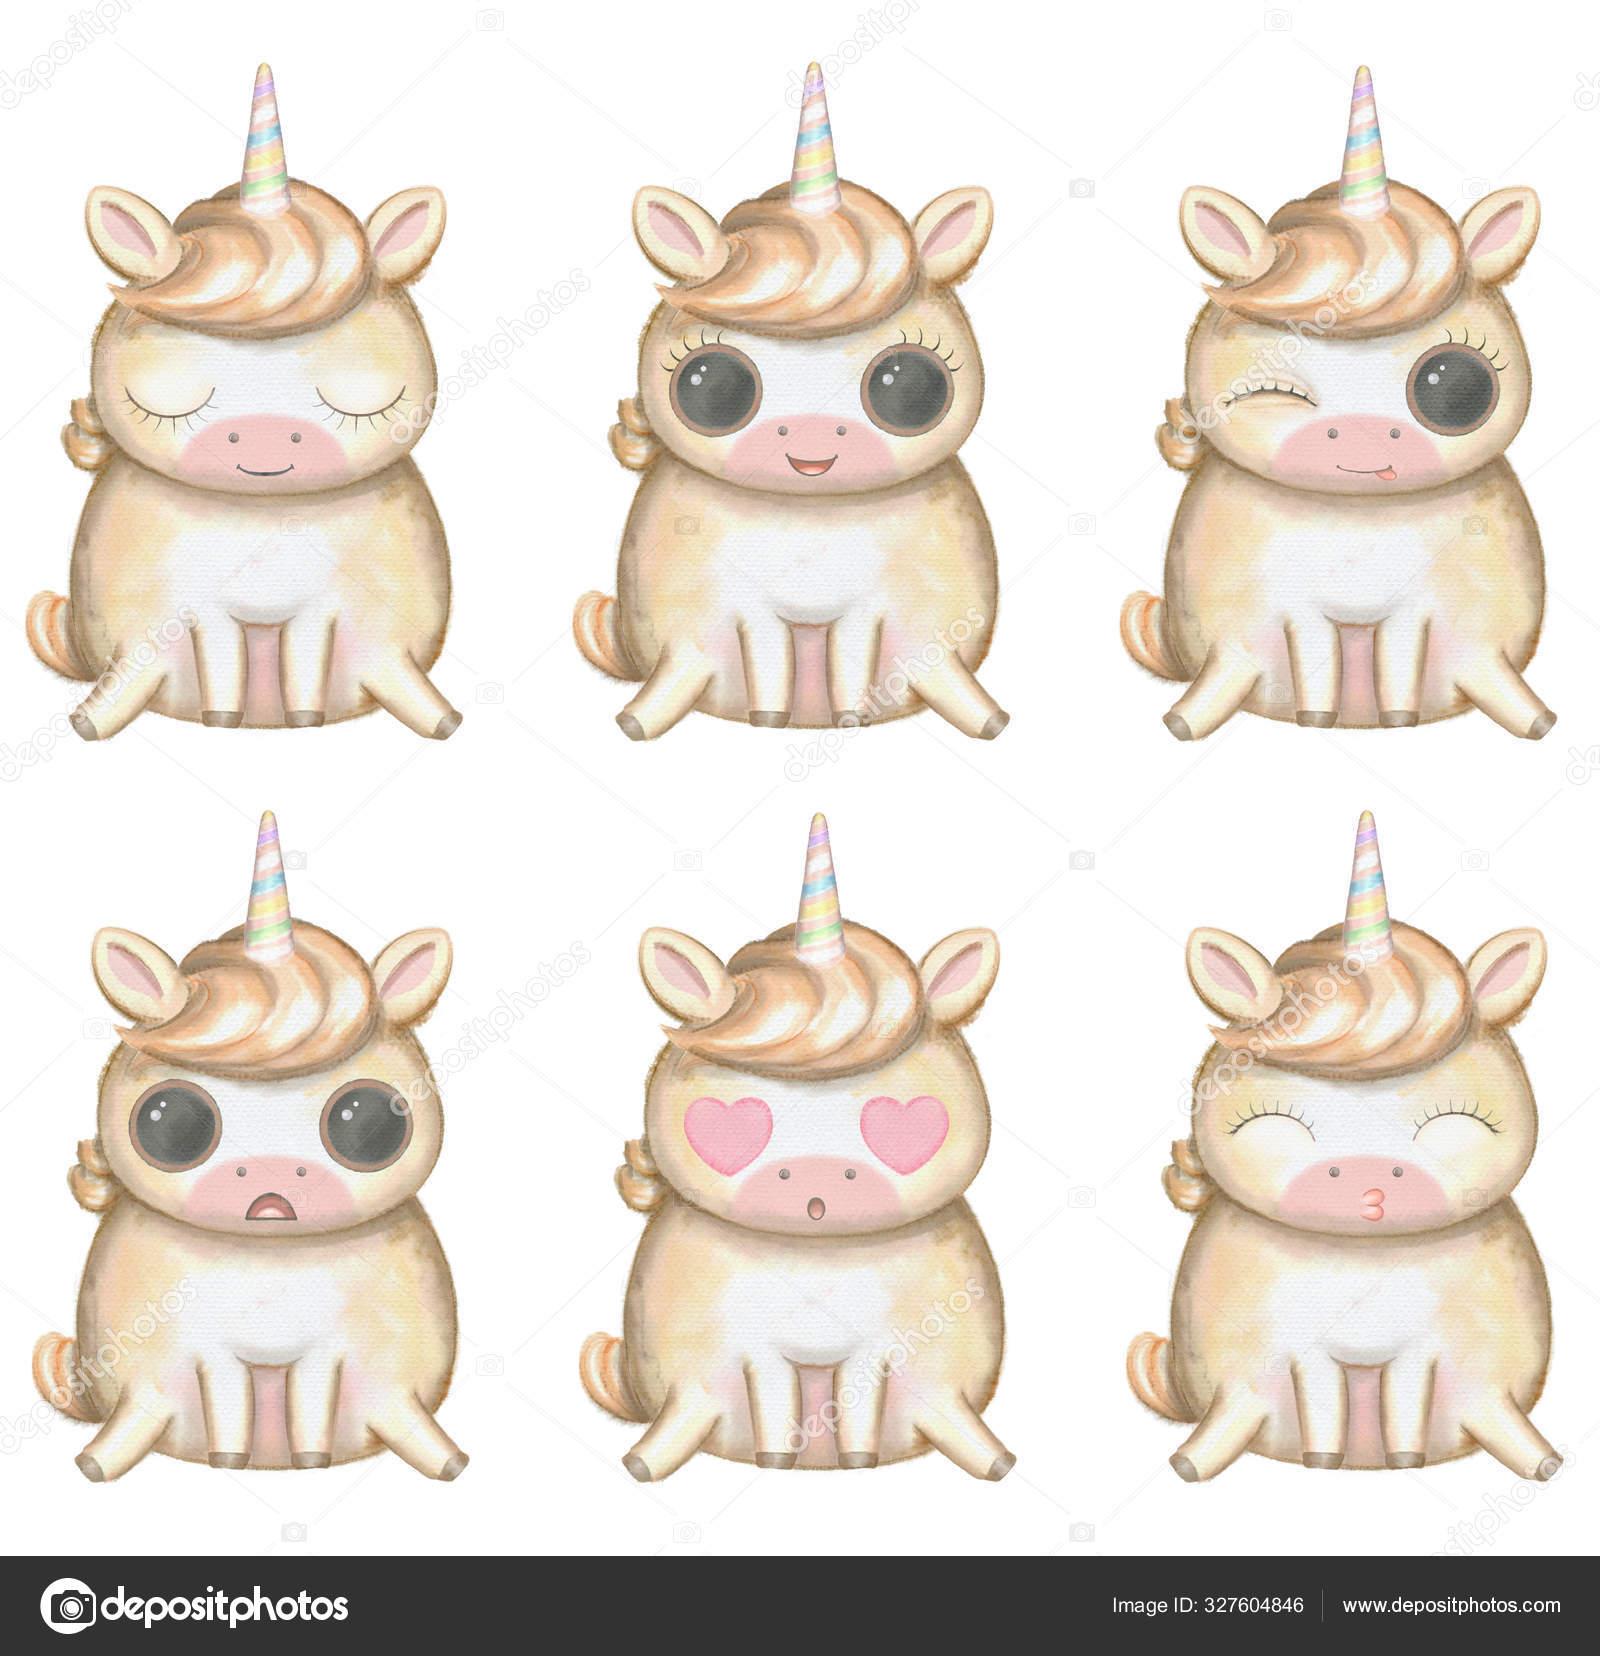 Funny Kawaii Cartoon Cute Unicorn Big Eyes Six Versions Different